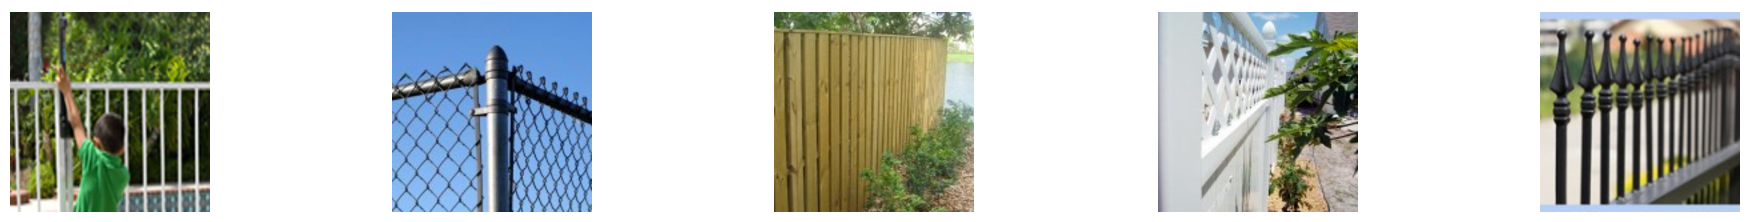 1316-fences1